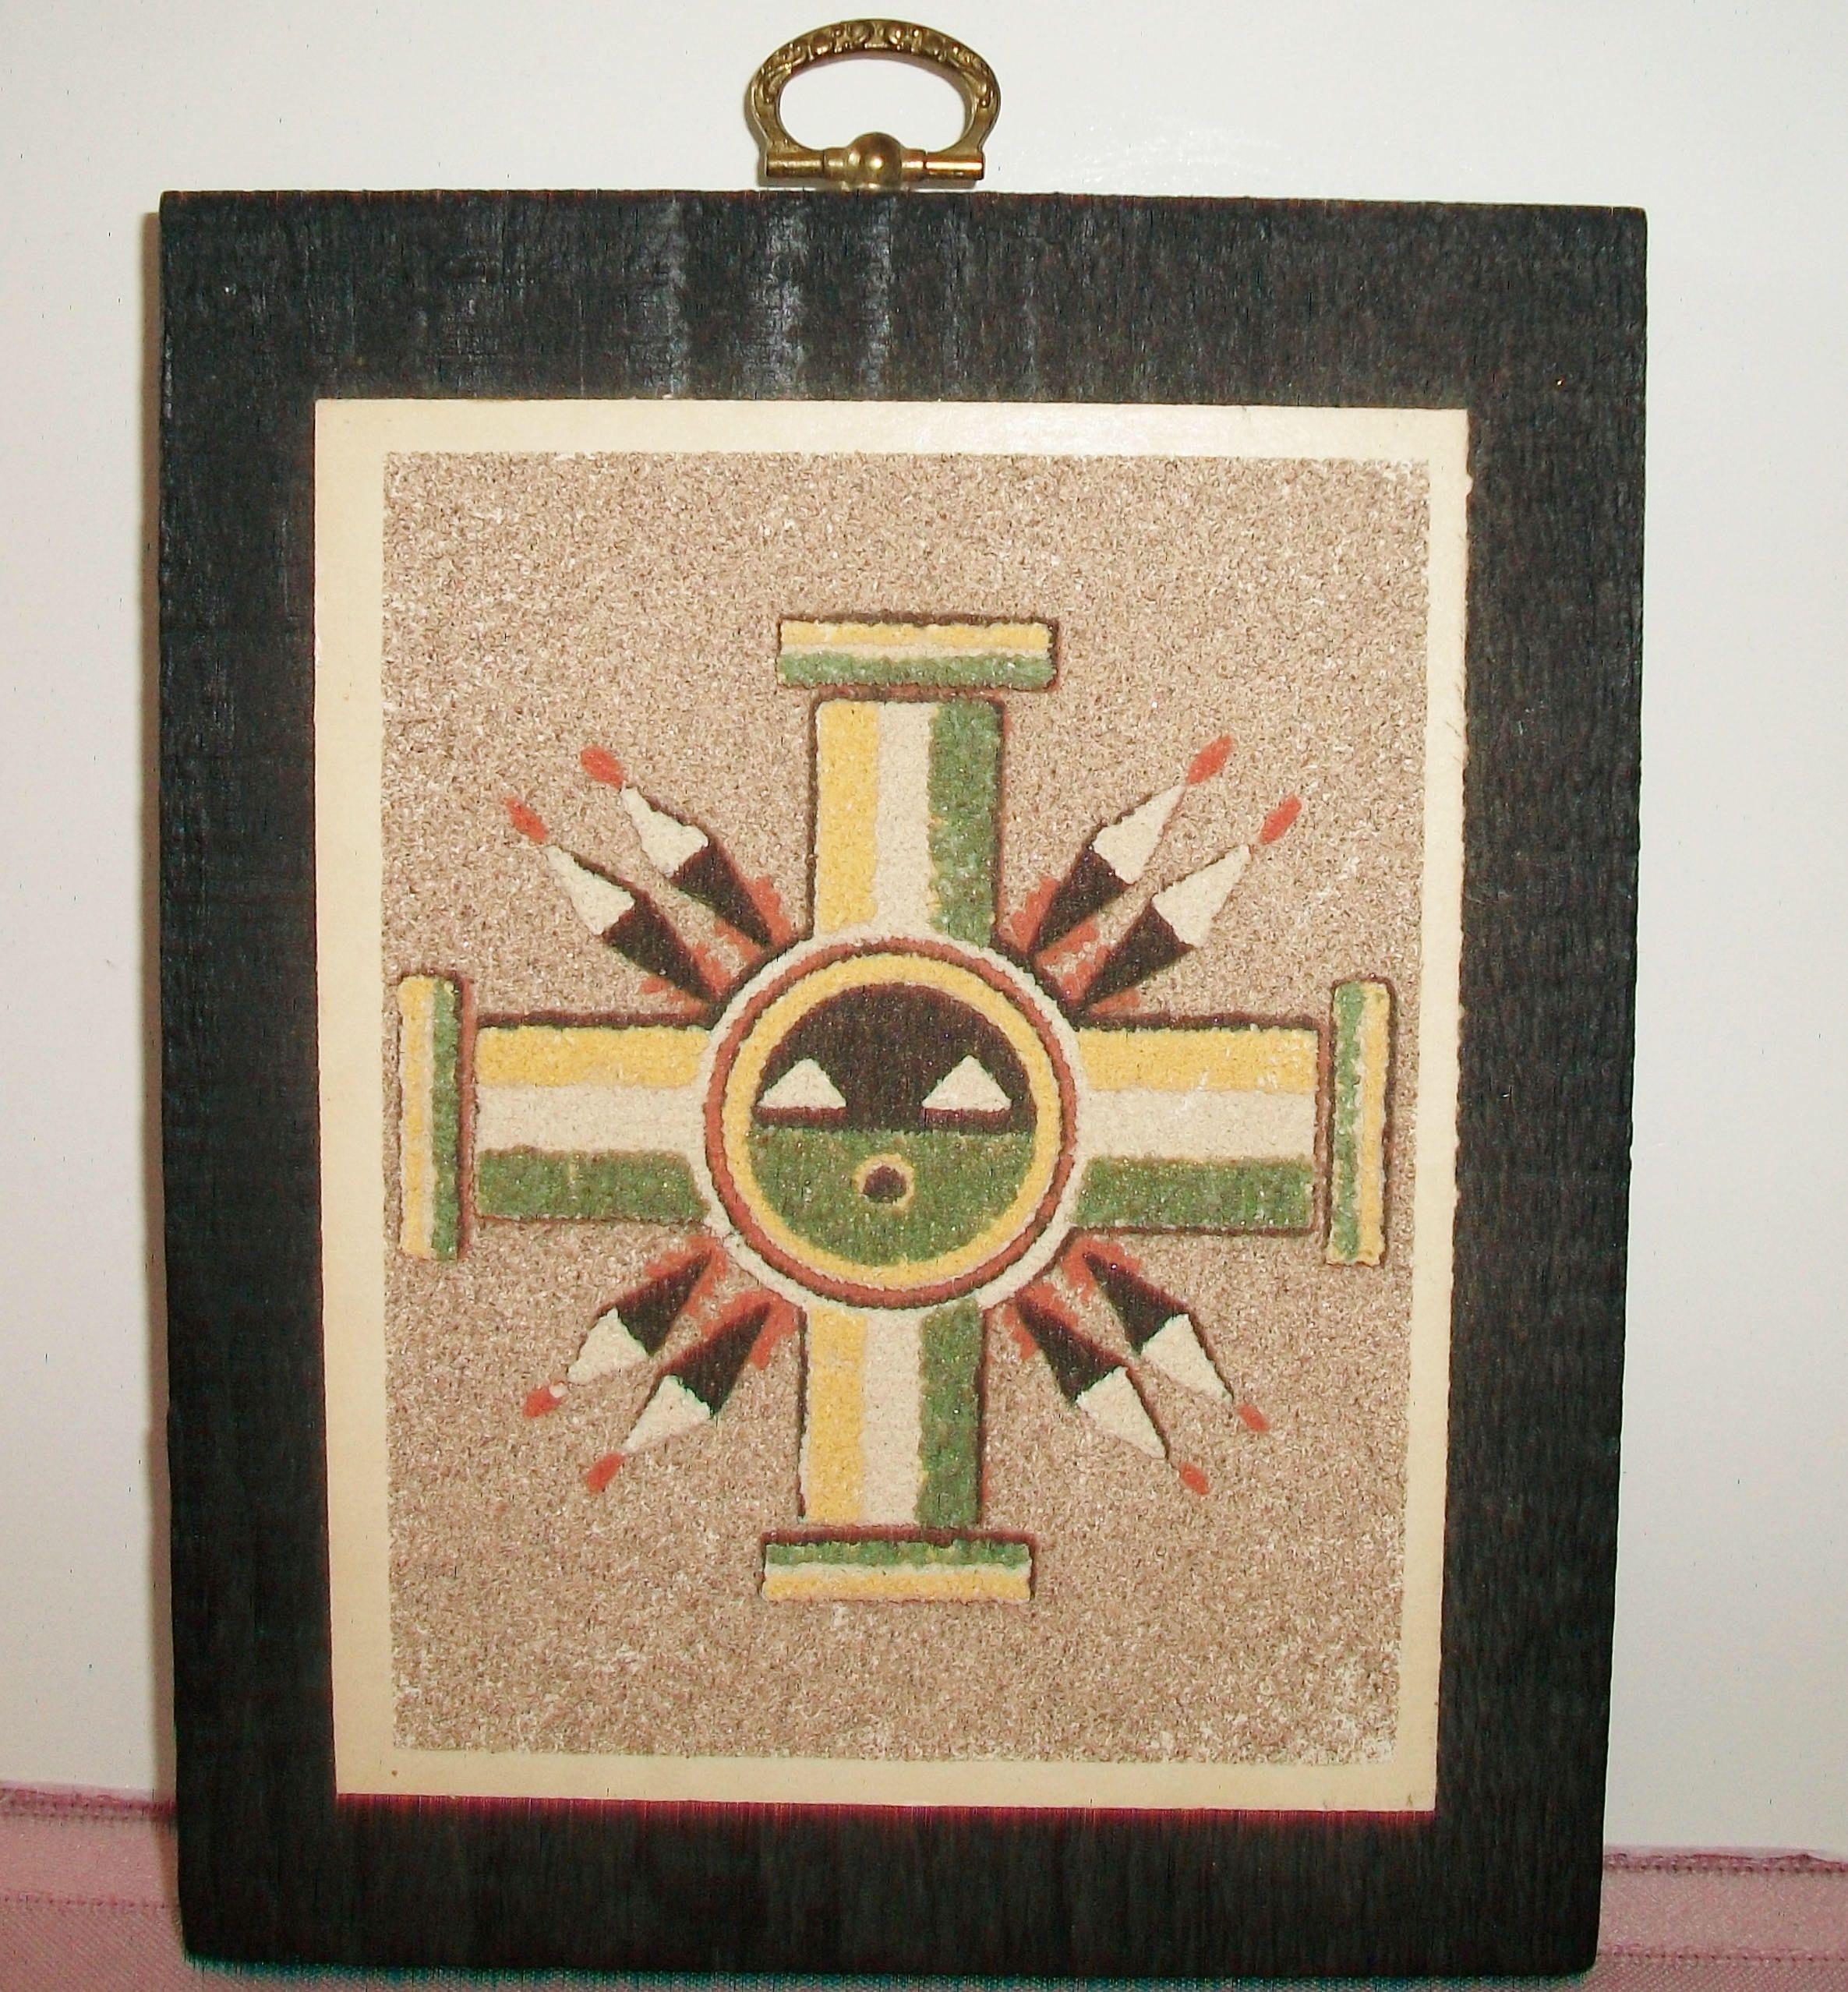 Native american sun symbol sand art wall decor vintage